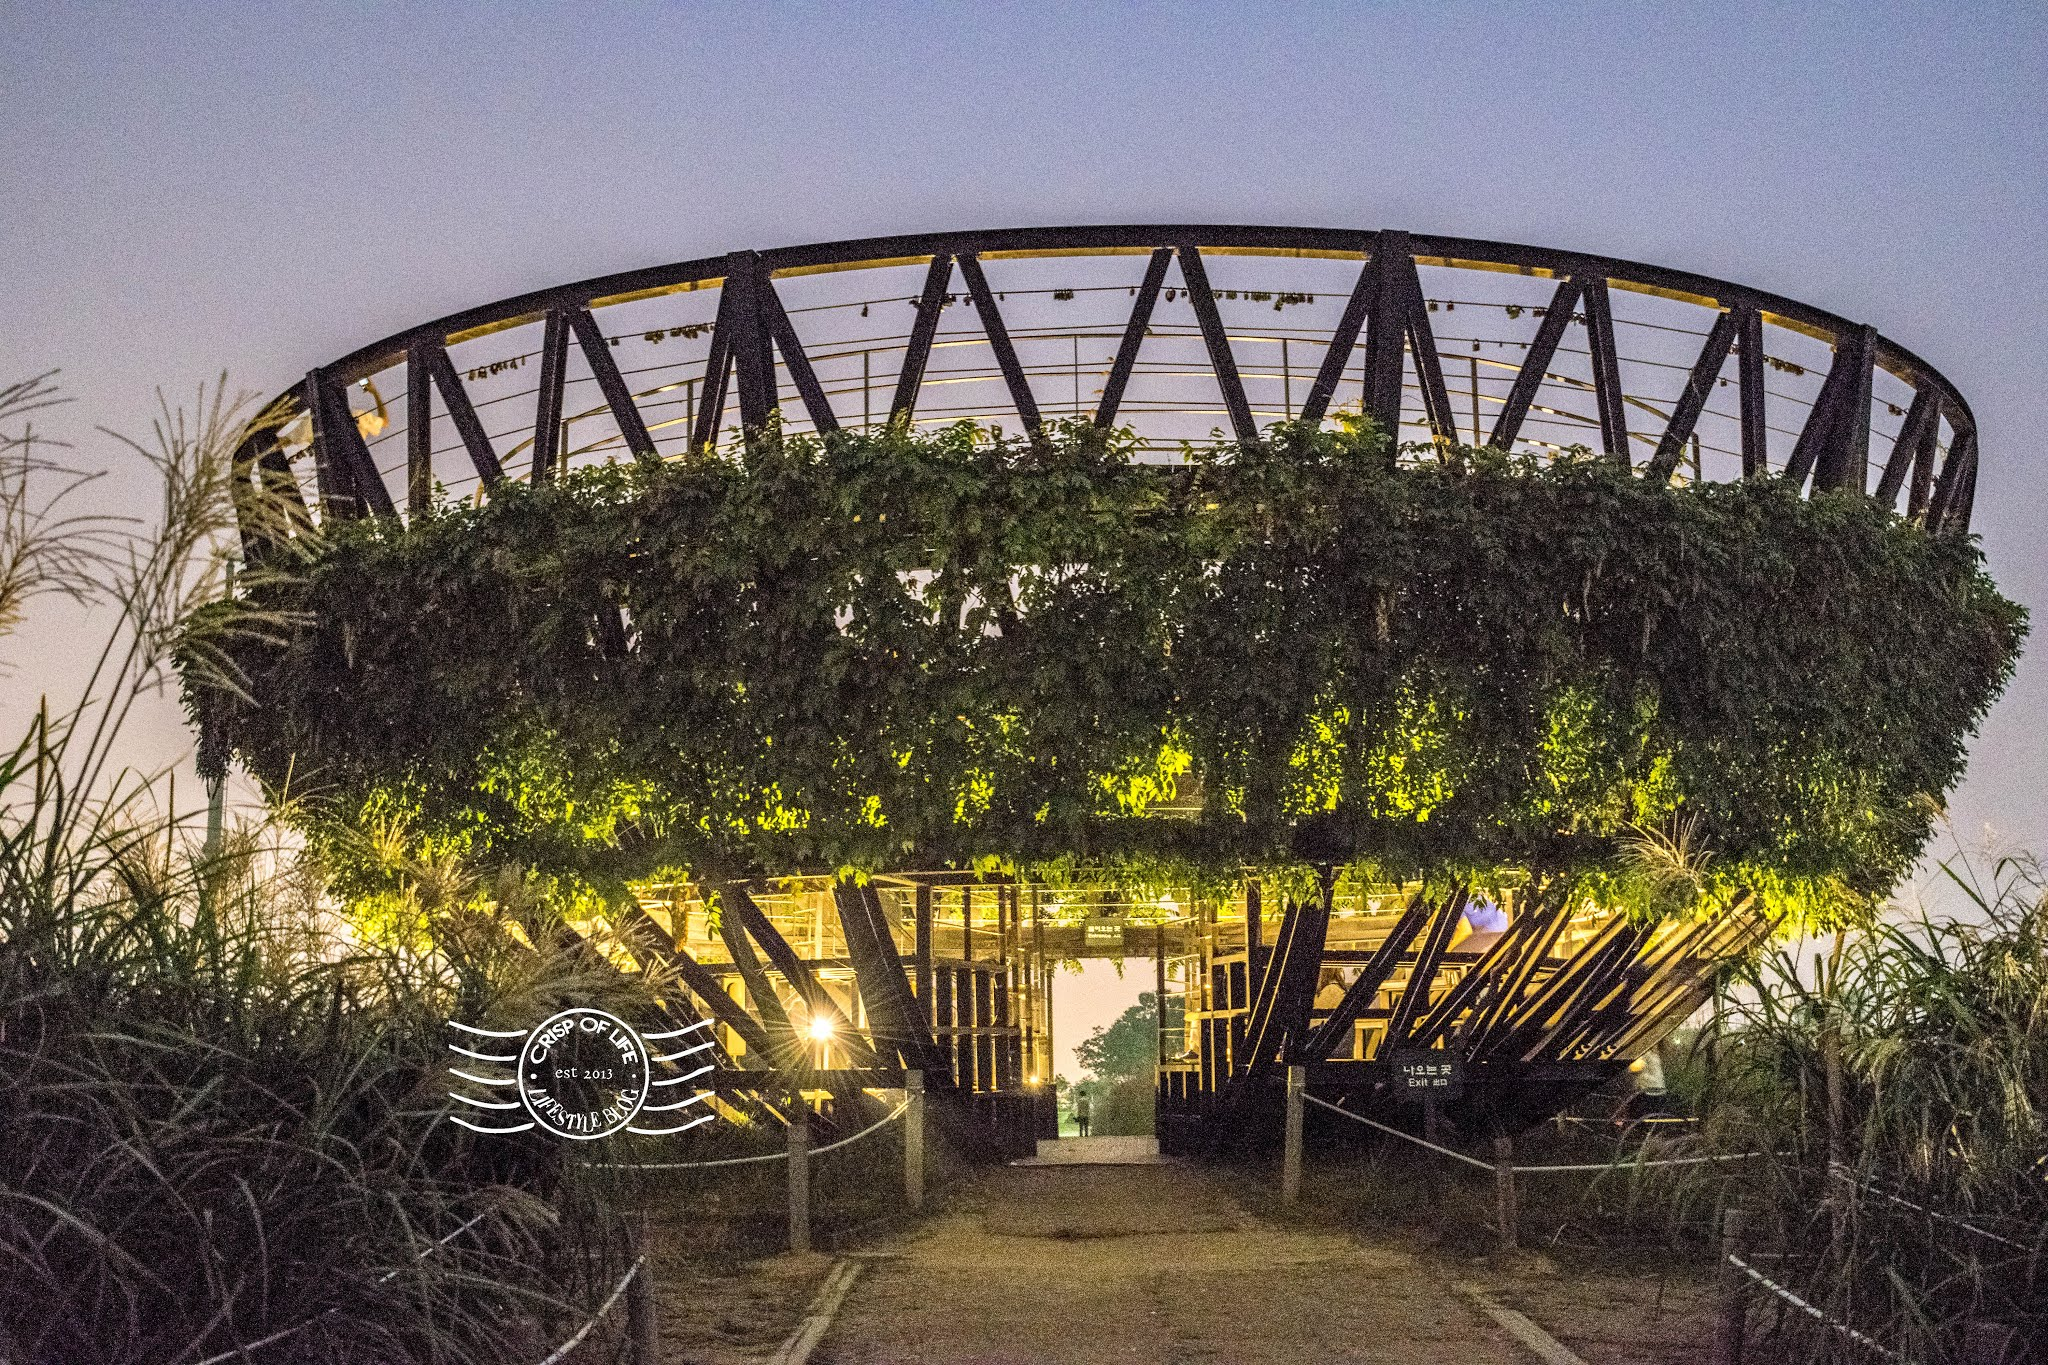 Haneul Park - A Secret Spot for Instagram Worthy Photos in Seoul, South Korea